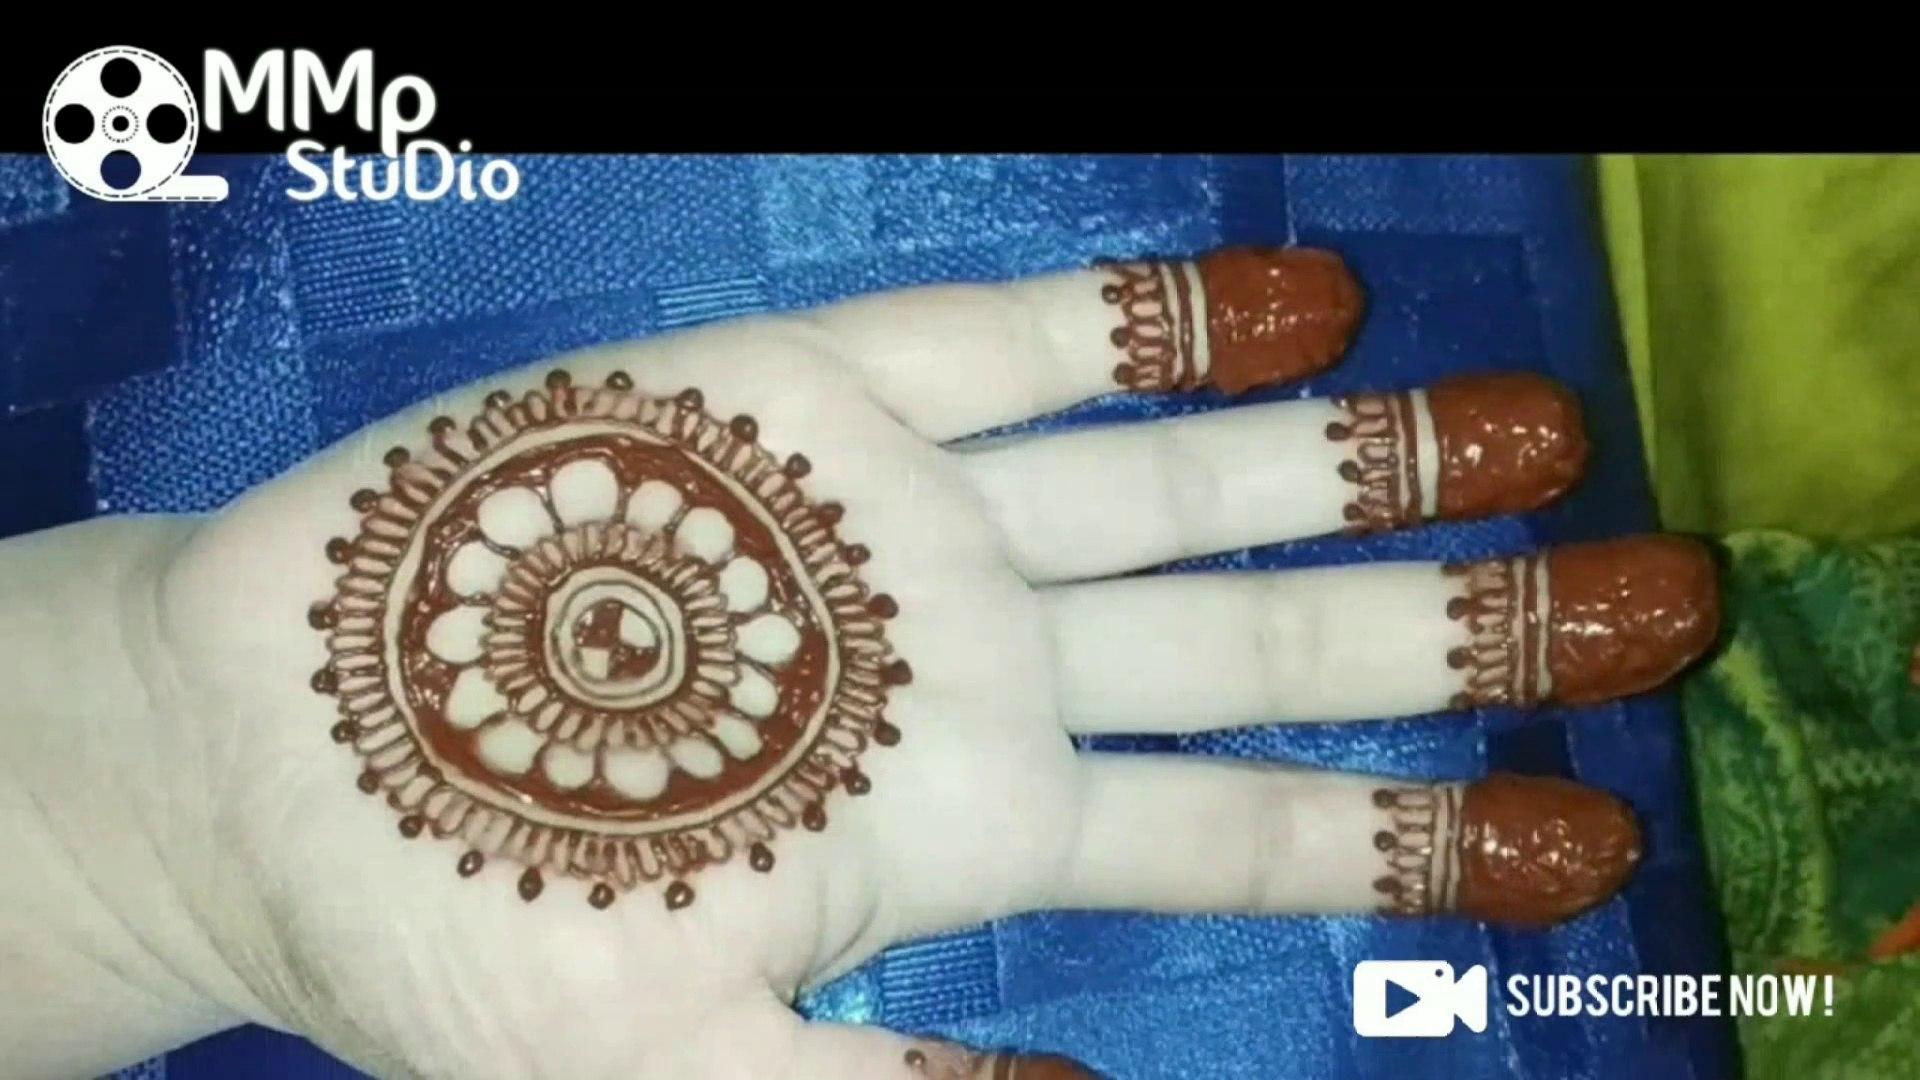 Beautiful Gol Tikki Mehndi Design For Front Hand Latest Floral Arabic Henna Design By Mmp